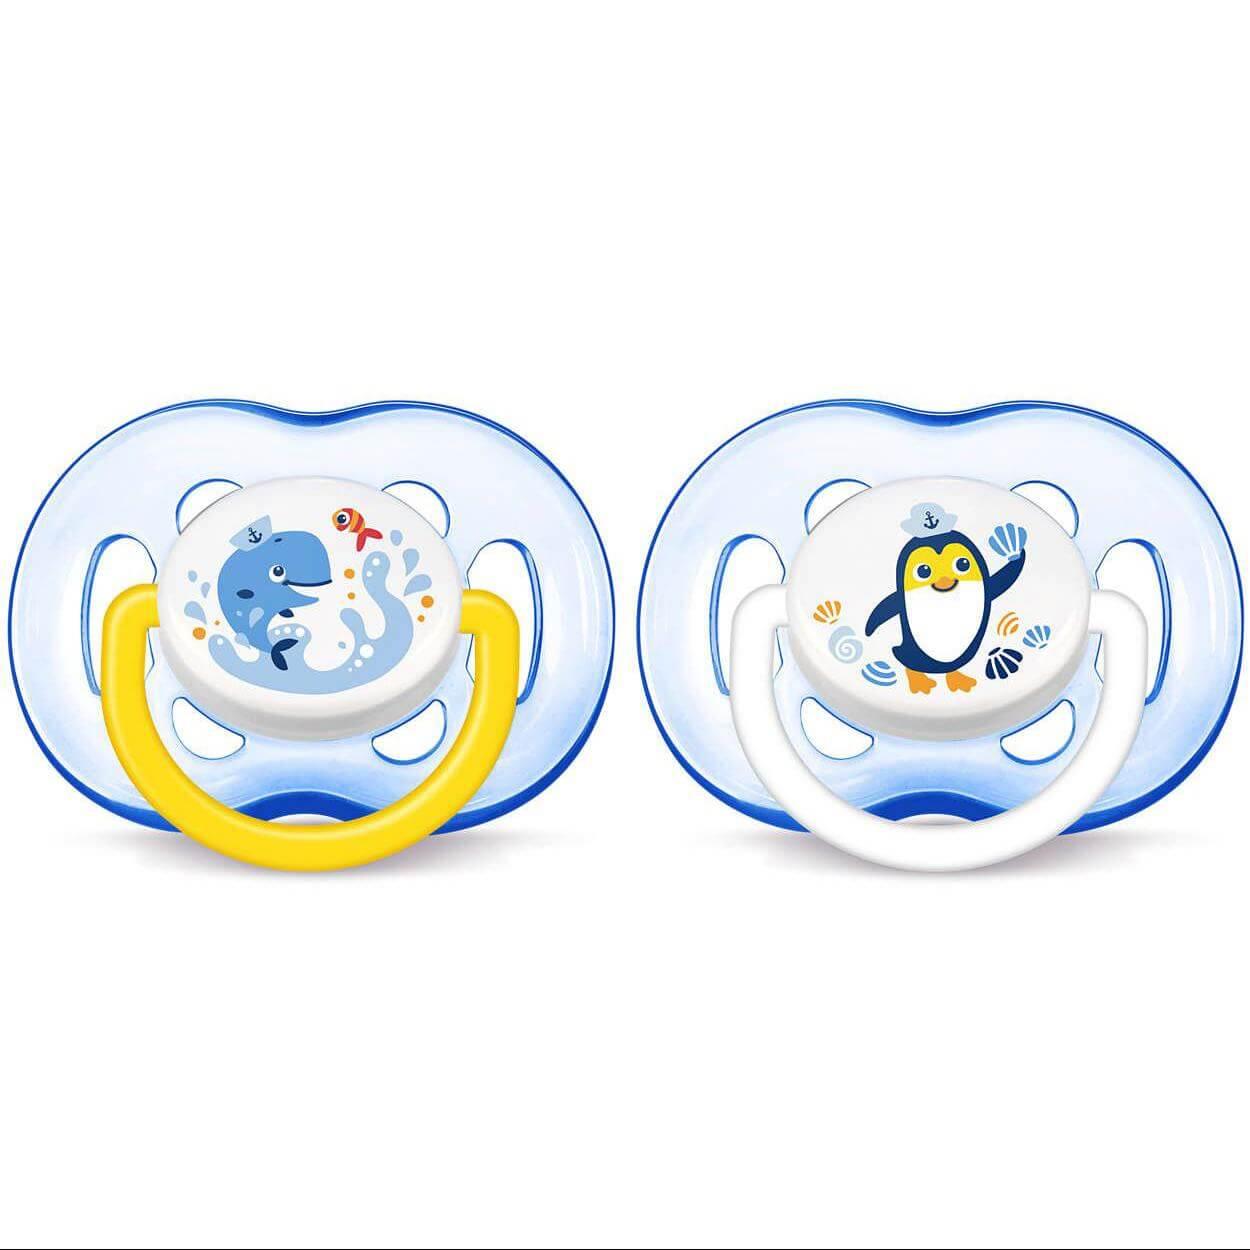 Avent Πιπίλα Σιλικόνης Κλασσική 18m+ Μηνών & Άνω 2 Τεμάχια Μπλε SCF186/24